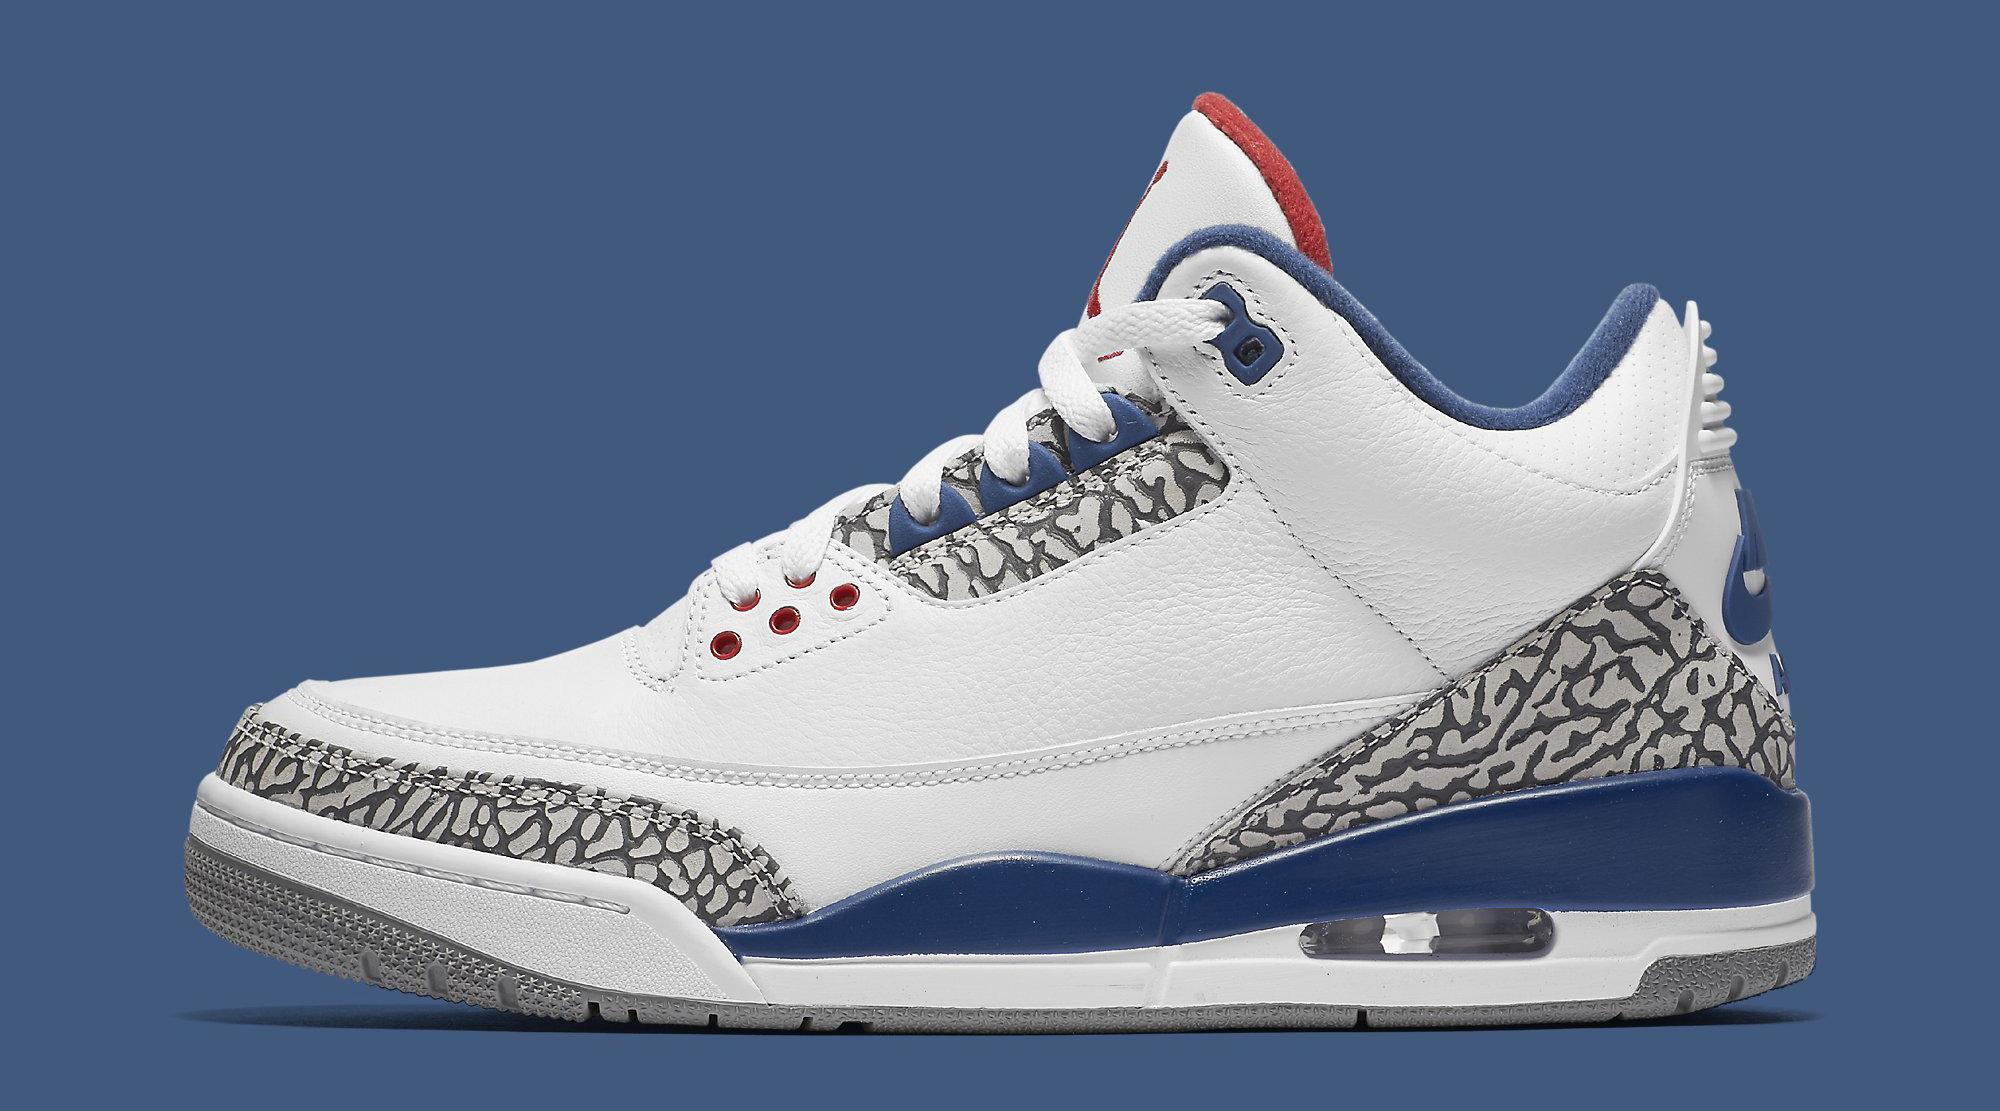 True Blue Air Jordan 3 854262 106 Black Friday | Sole Collector